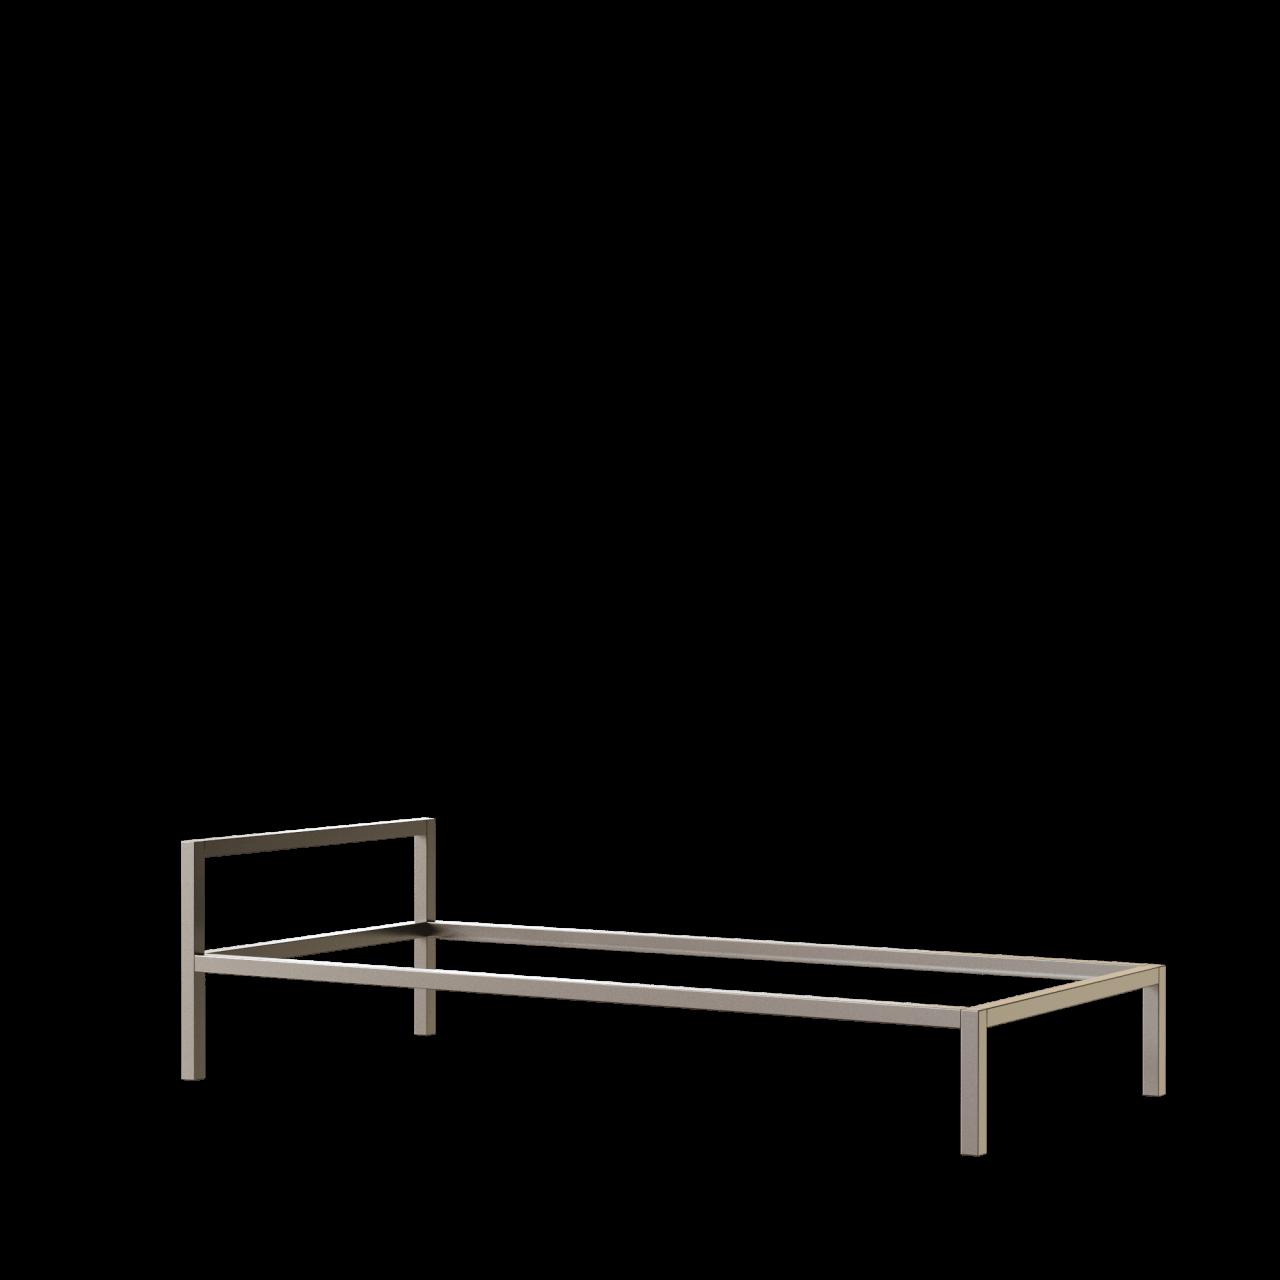 Aluminium Bett mit Kopfteil